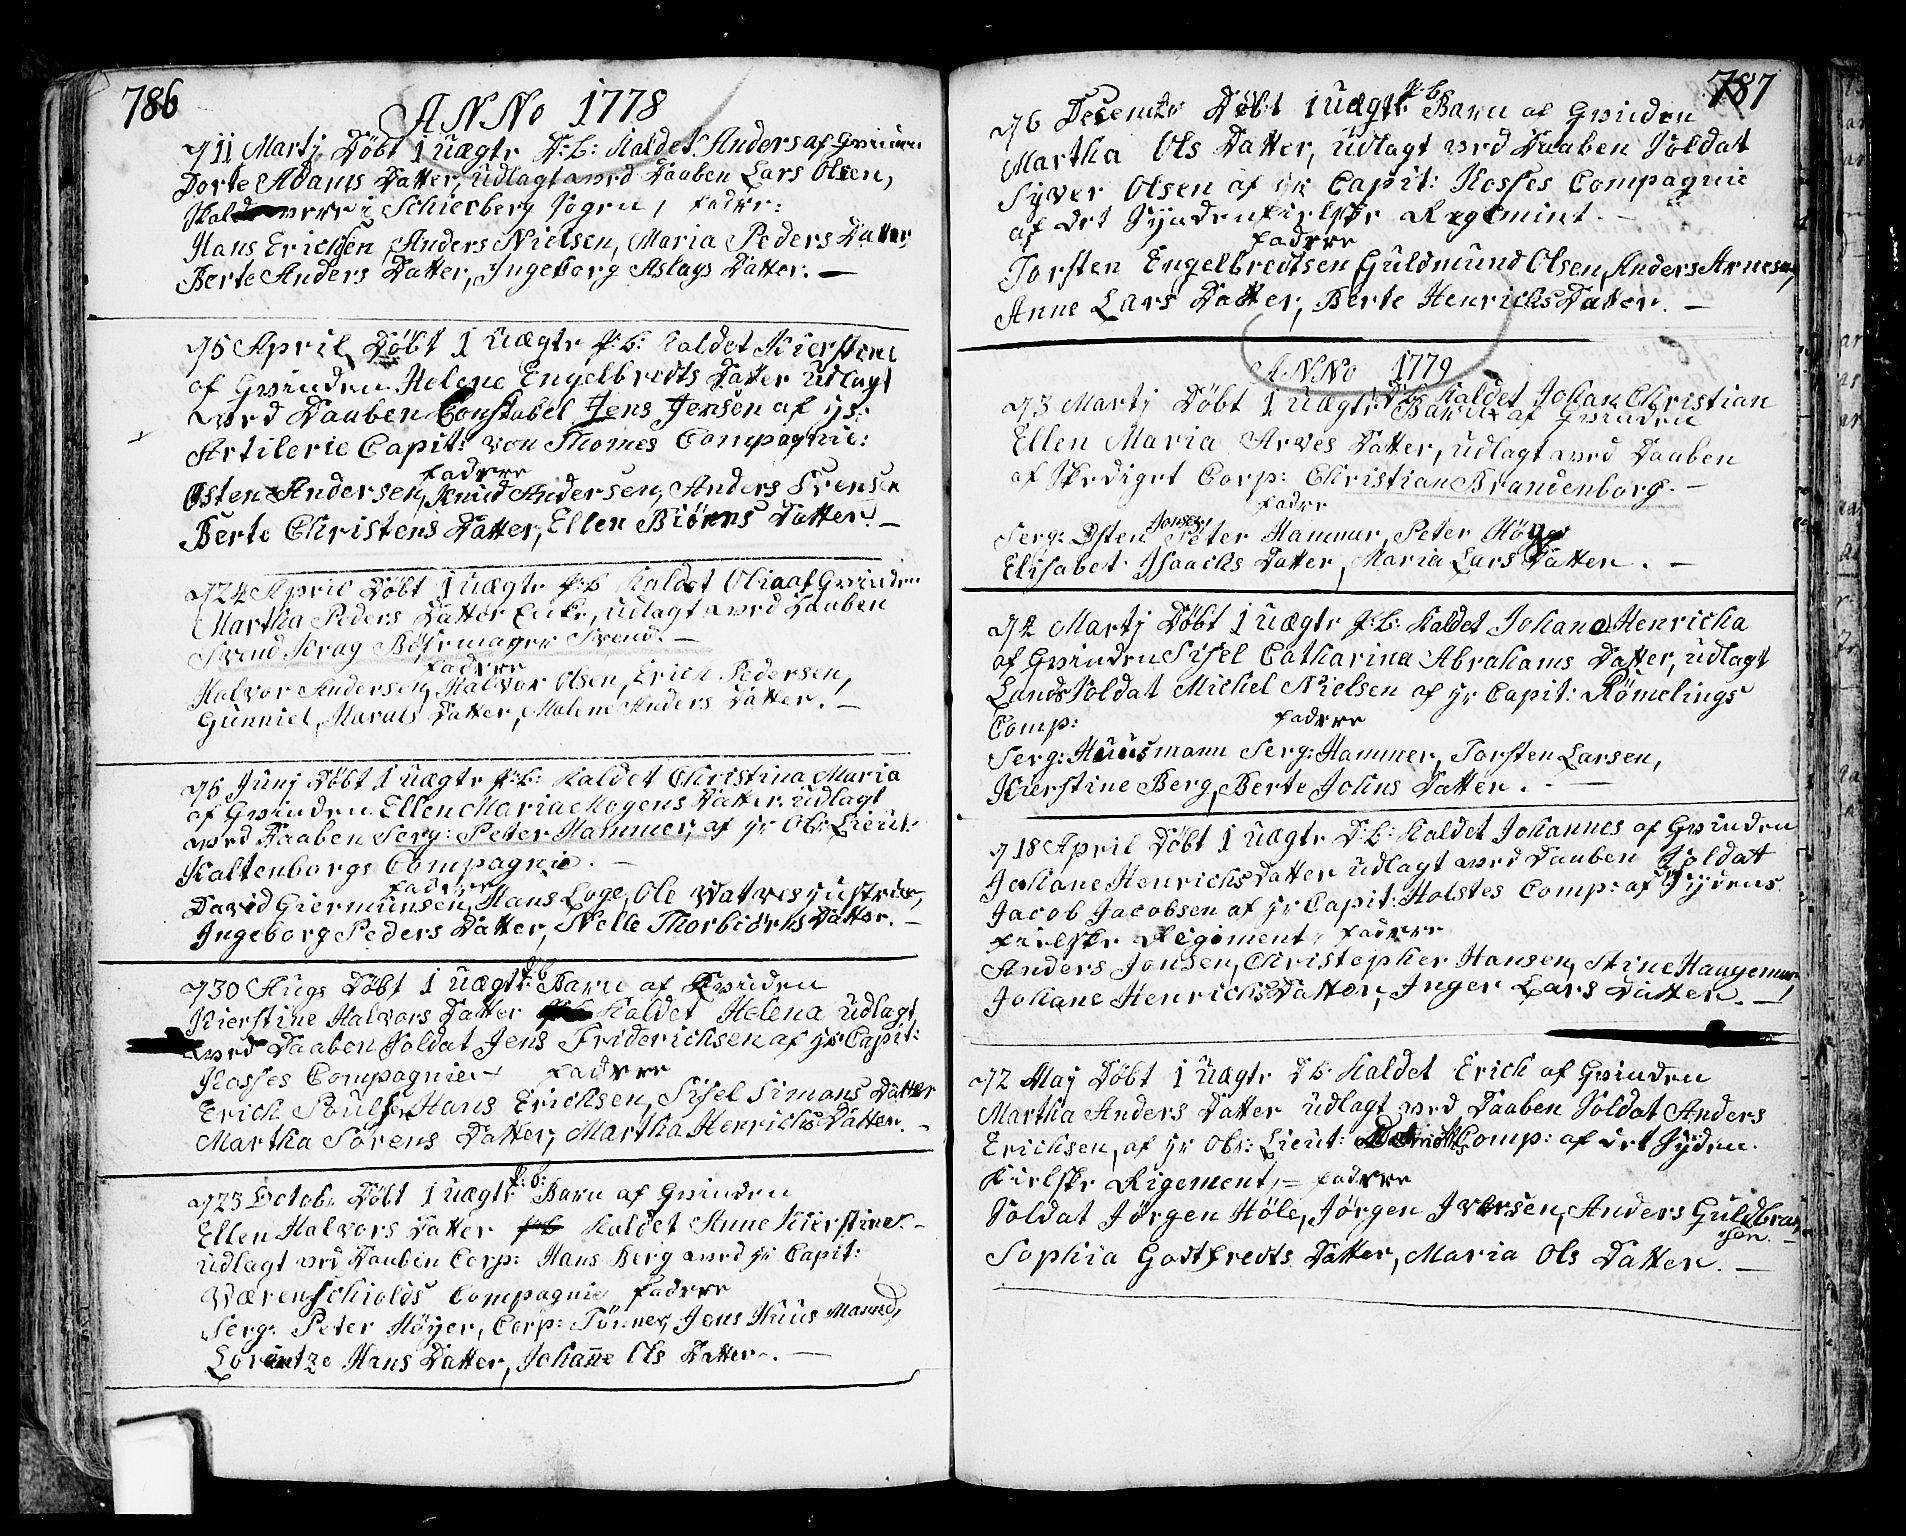 SAO, Fredrikstad prestekontor Kirkebøker, F/Fa/L0002: Ministerialbok nr. 2, 1750-1804, s. 786-787